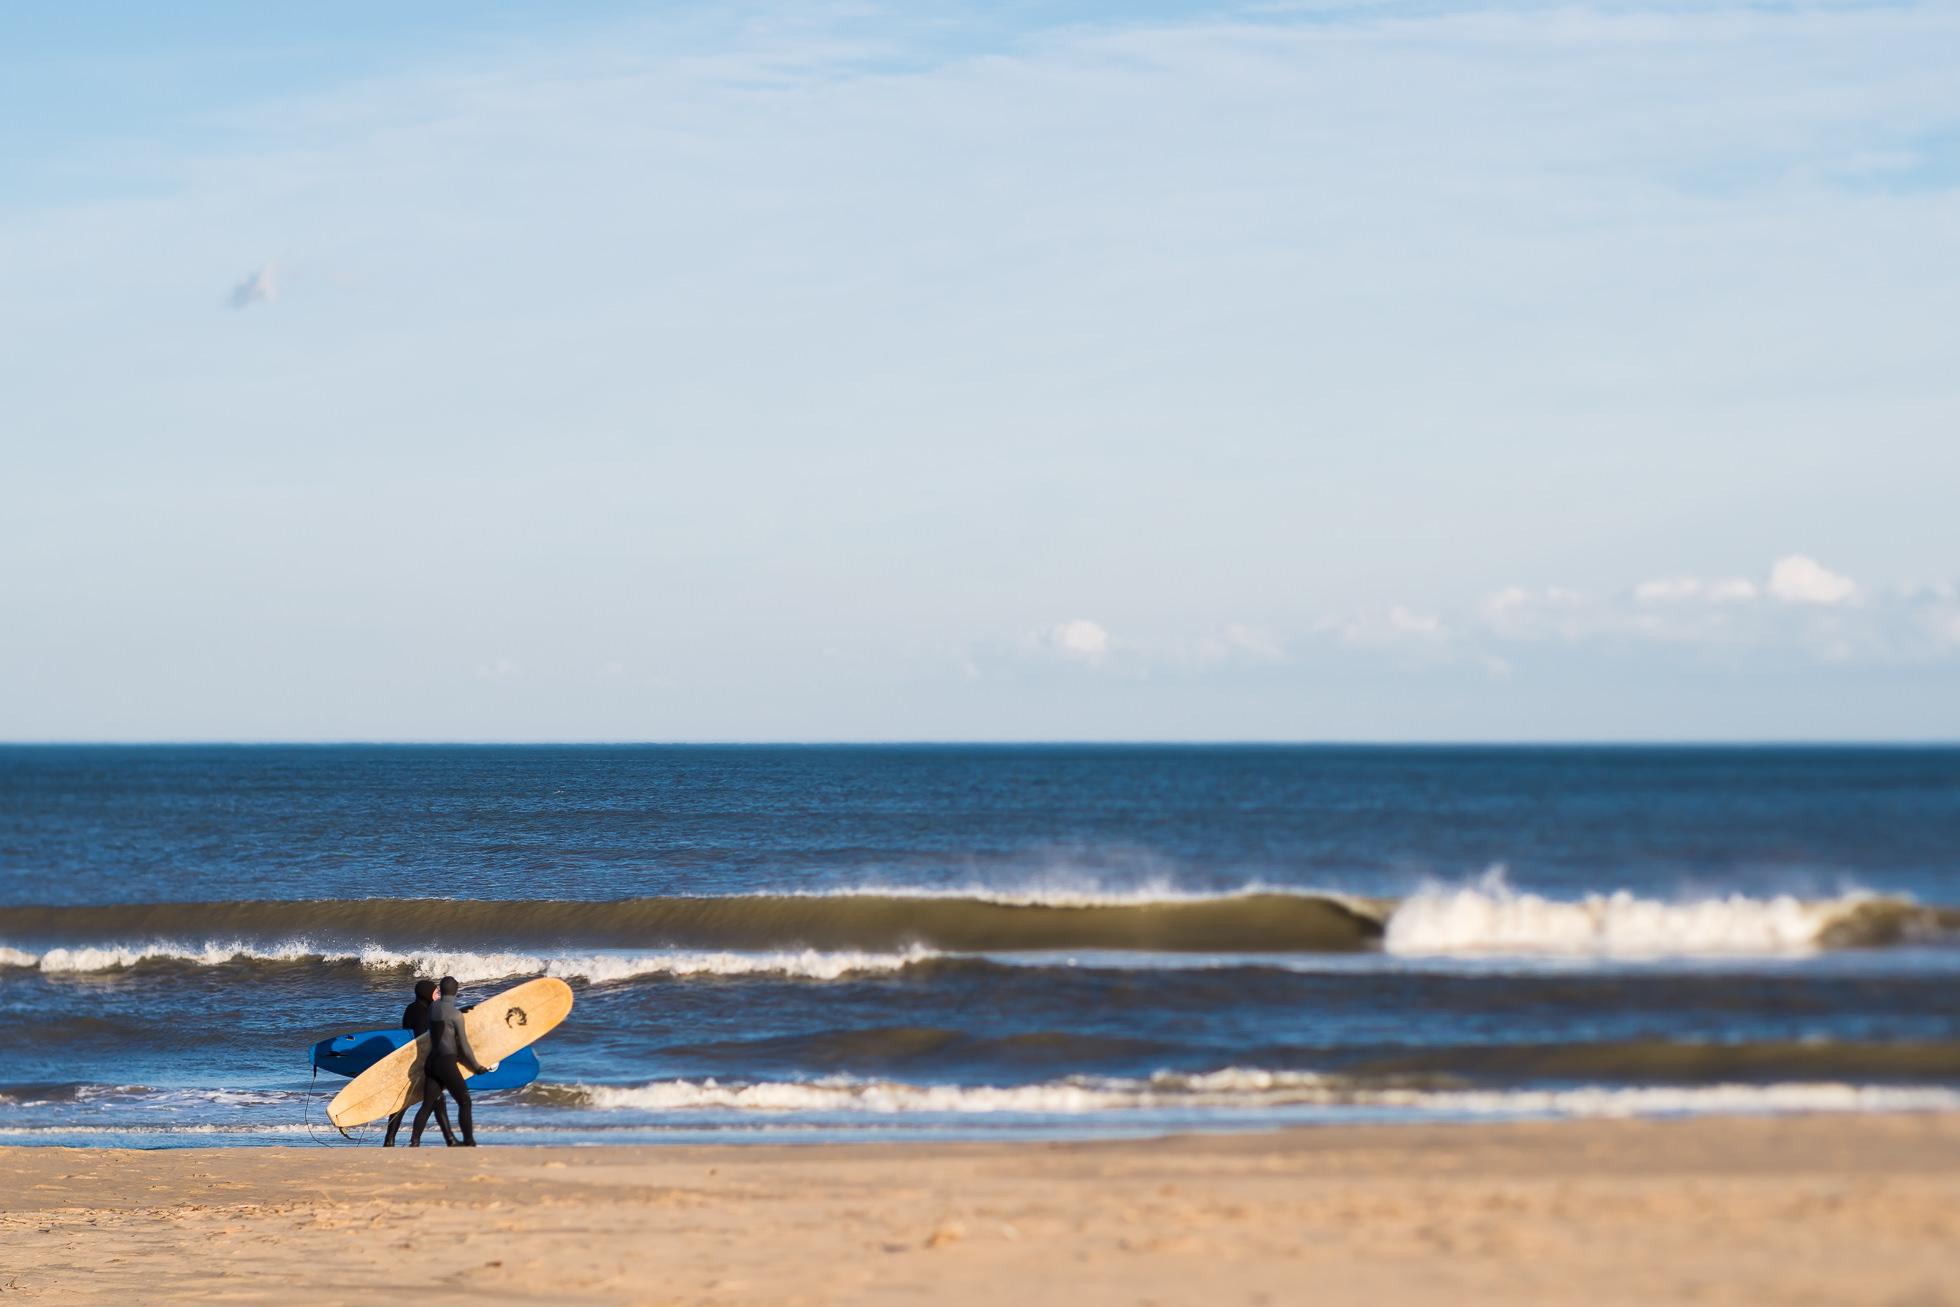 wave, beach, virginia beach photography, nature photographer, surfers